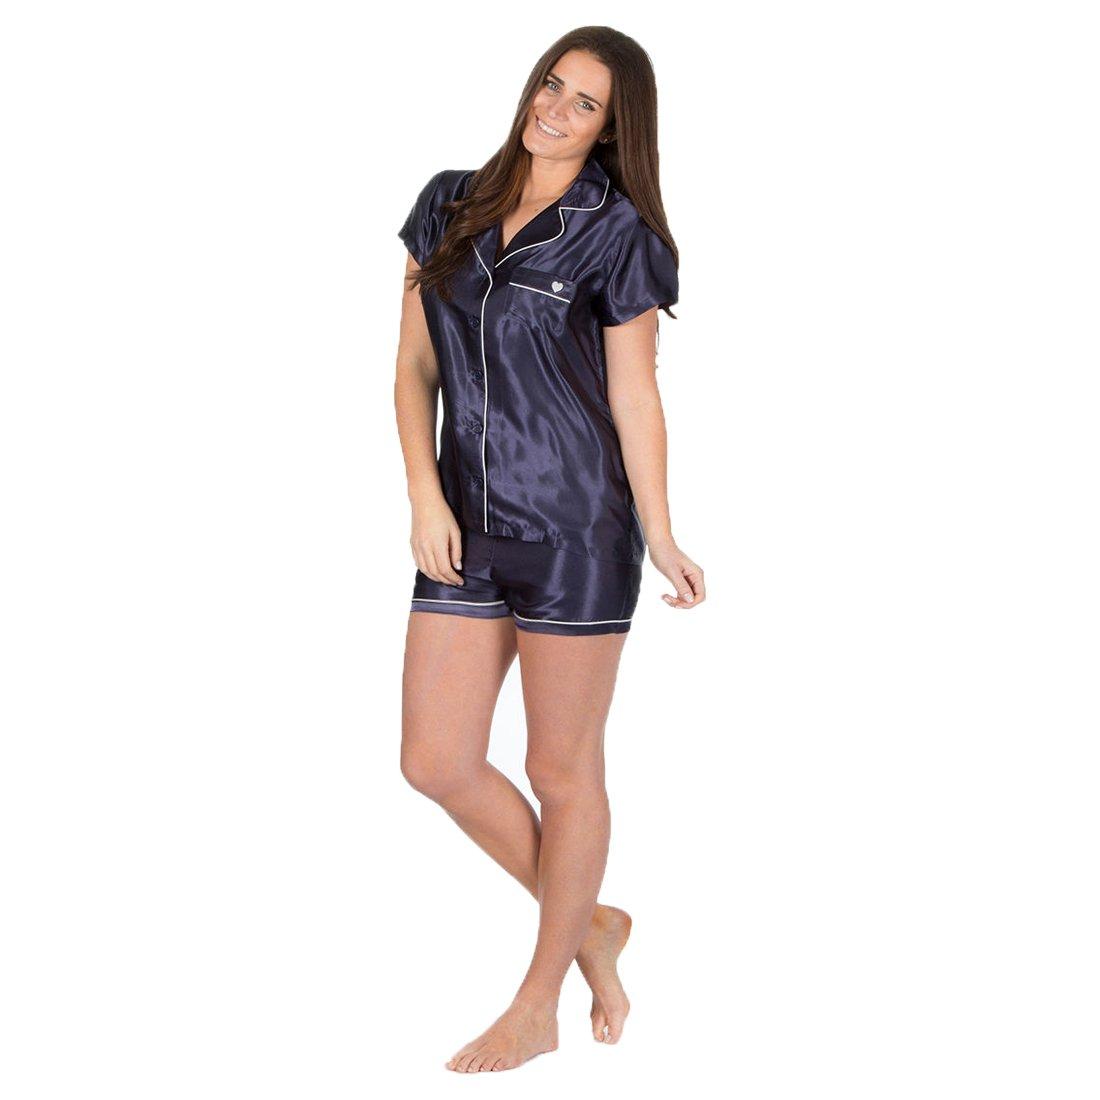 7295b50ed5 Ladies Forever Dreaming Silky Satin Pyjama Top Shorts Nightwear Sleepsuit  Pjs  Amazon.co.uk  Clothing